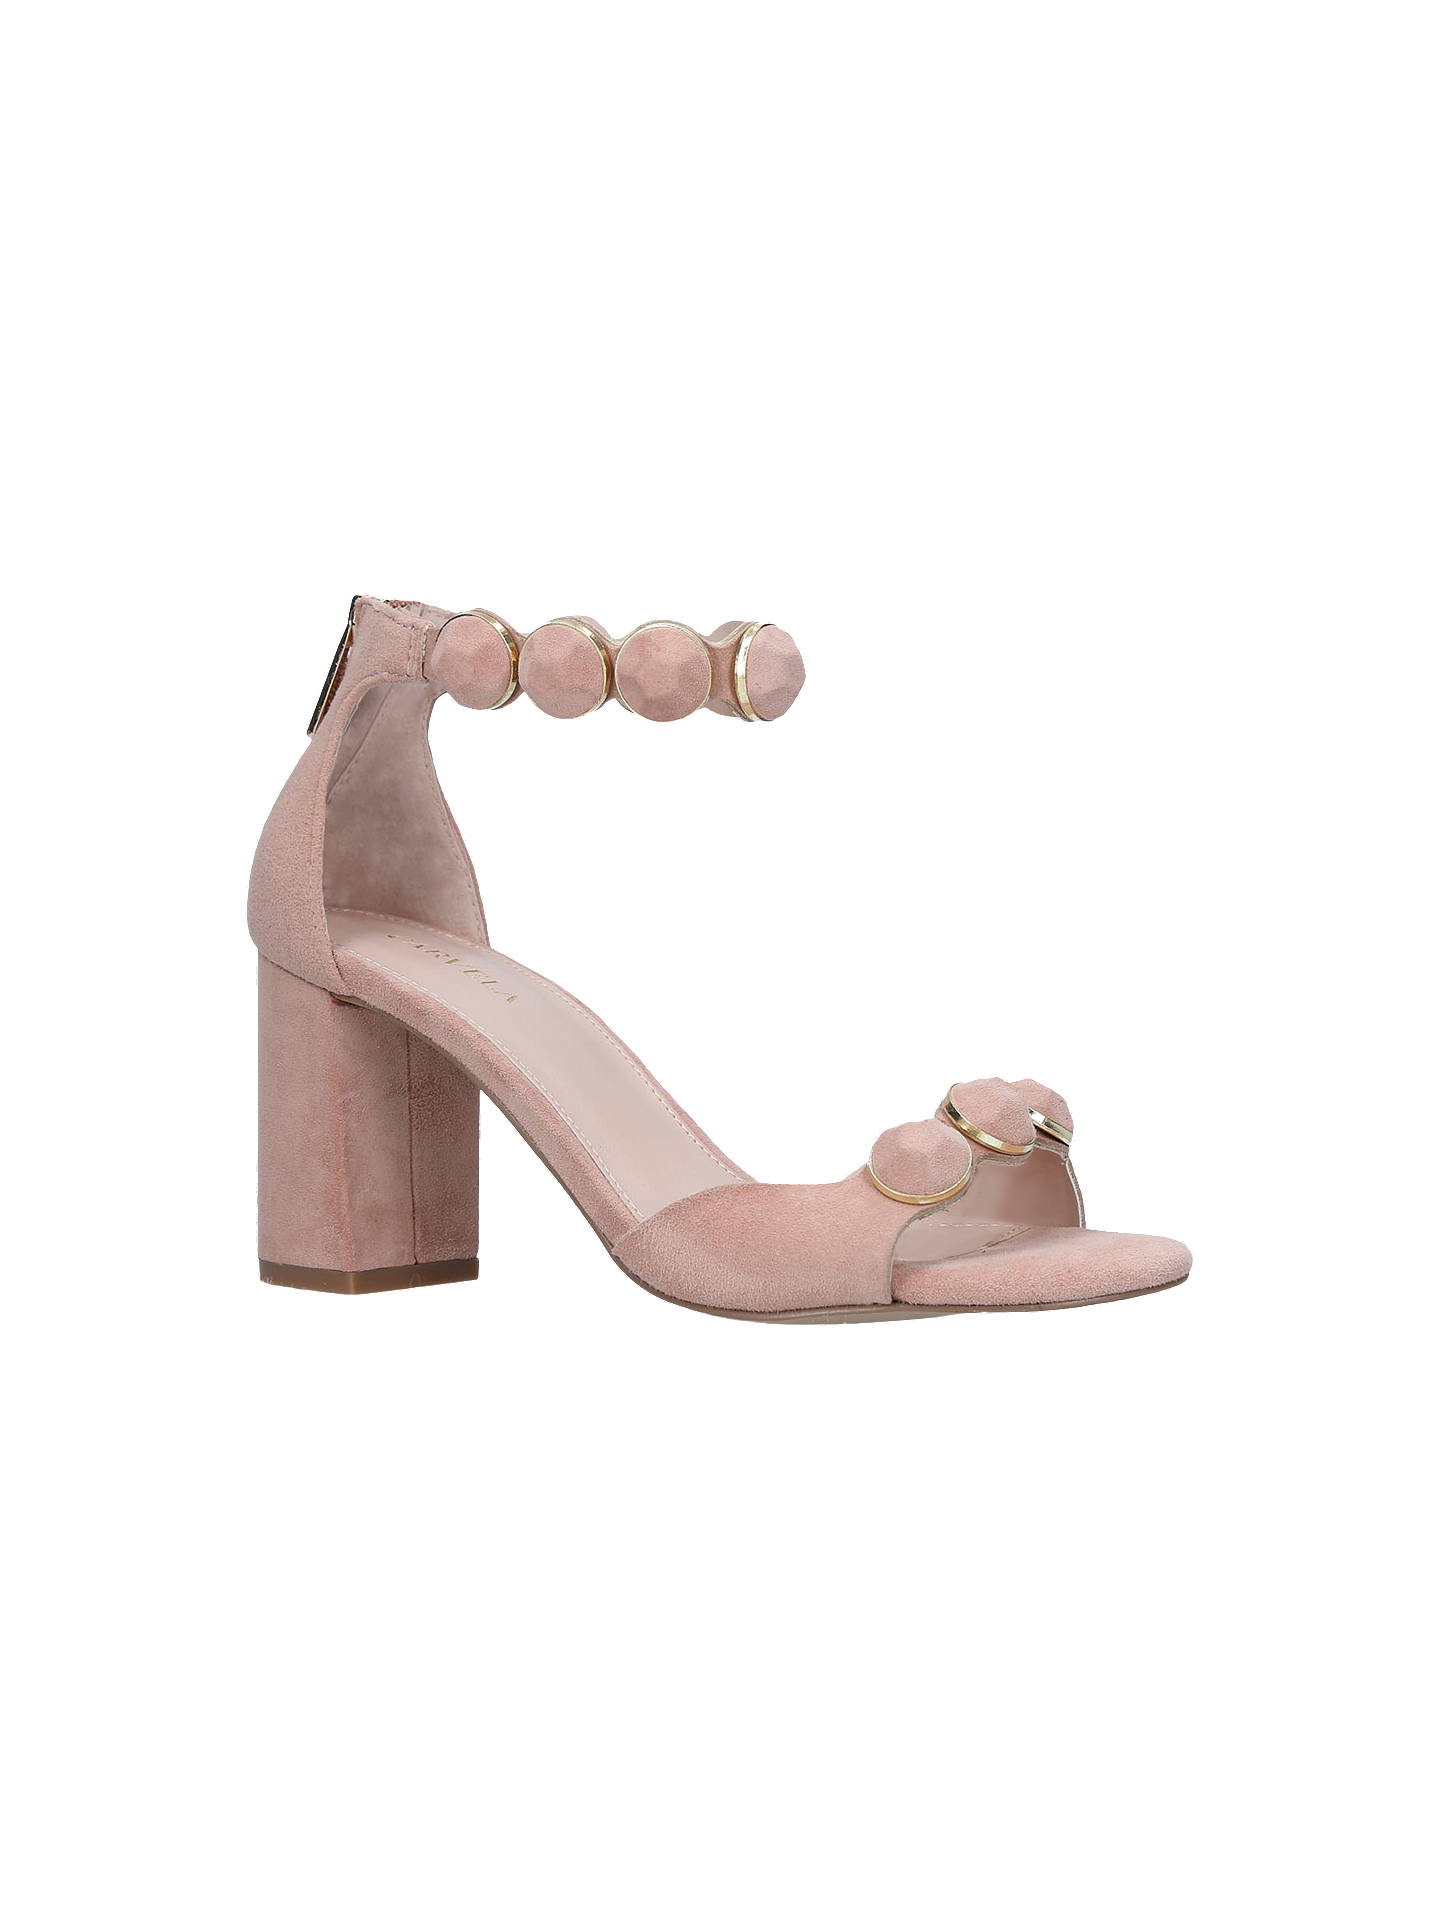 3f09dd3631d Carvela Gillian Block Heel Sandals at John Lewis & Partners